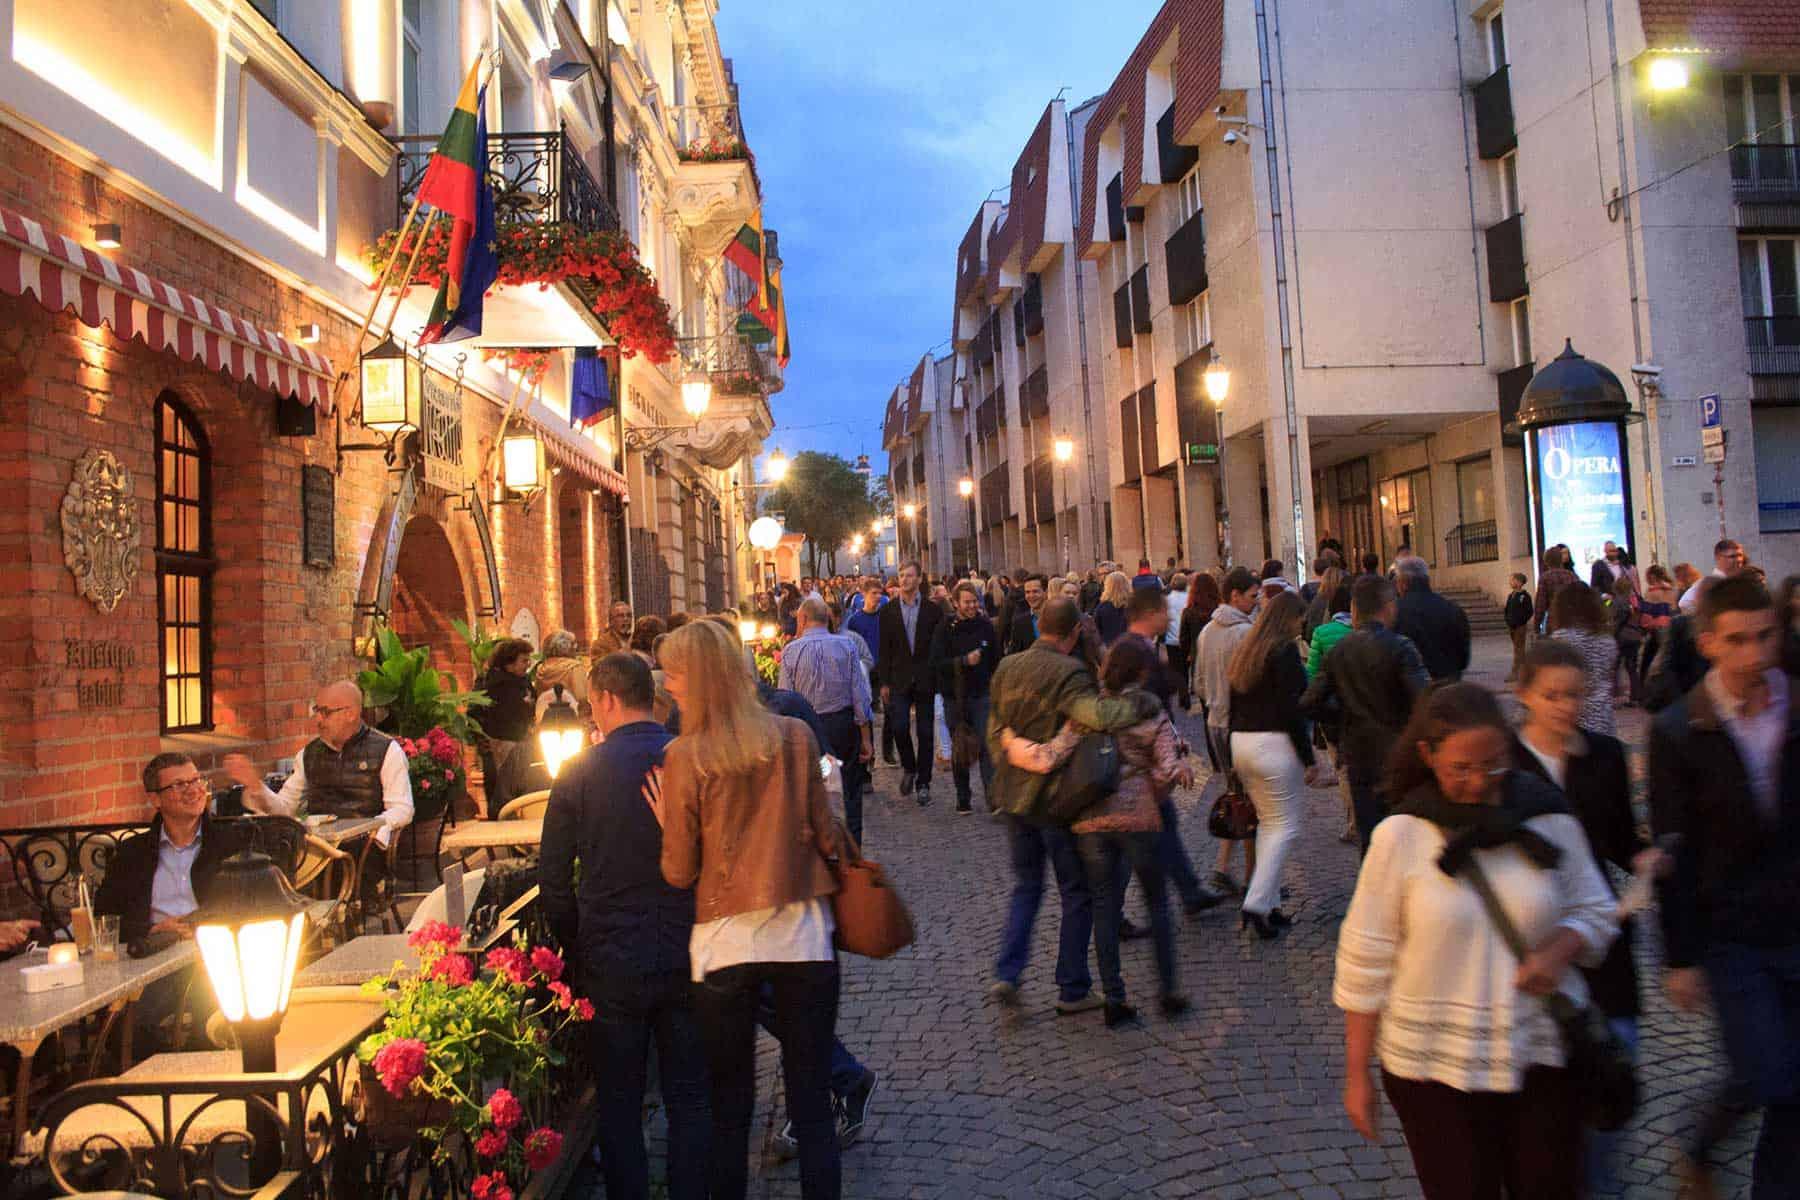 Resor_Litauen_Vilnius-Pilies-street-at-night_nygren_lind